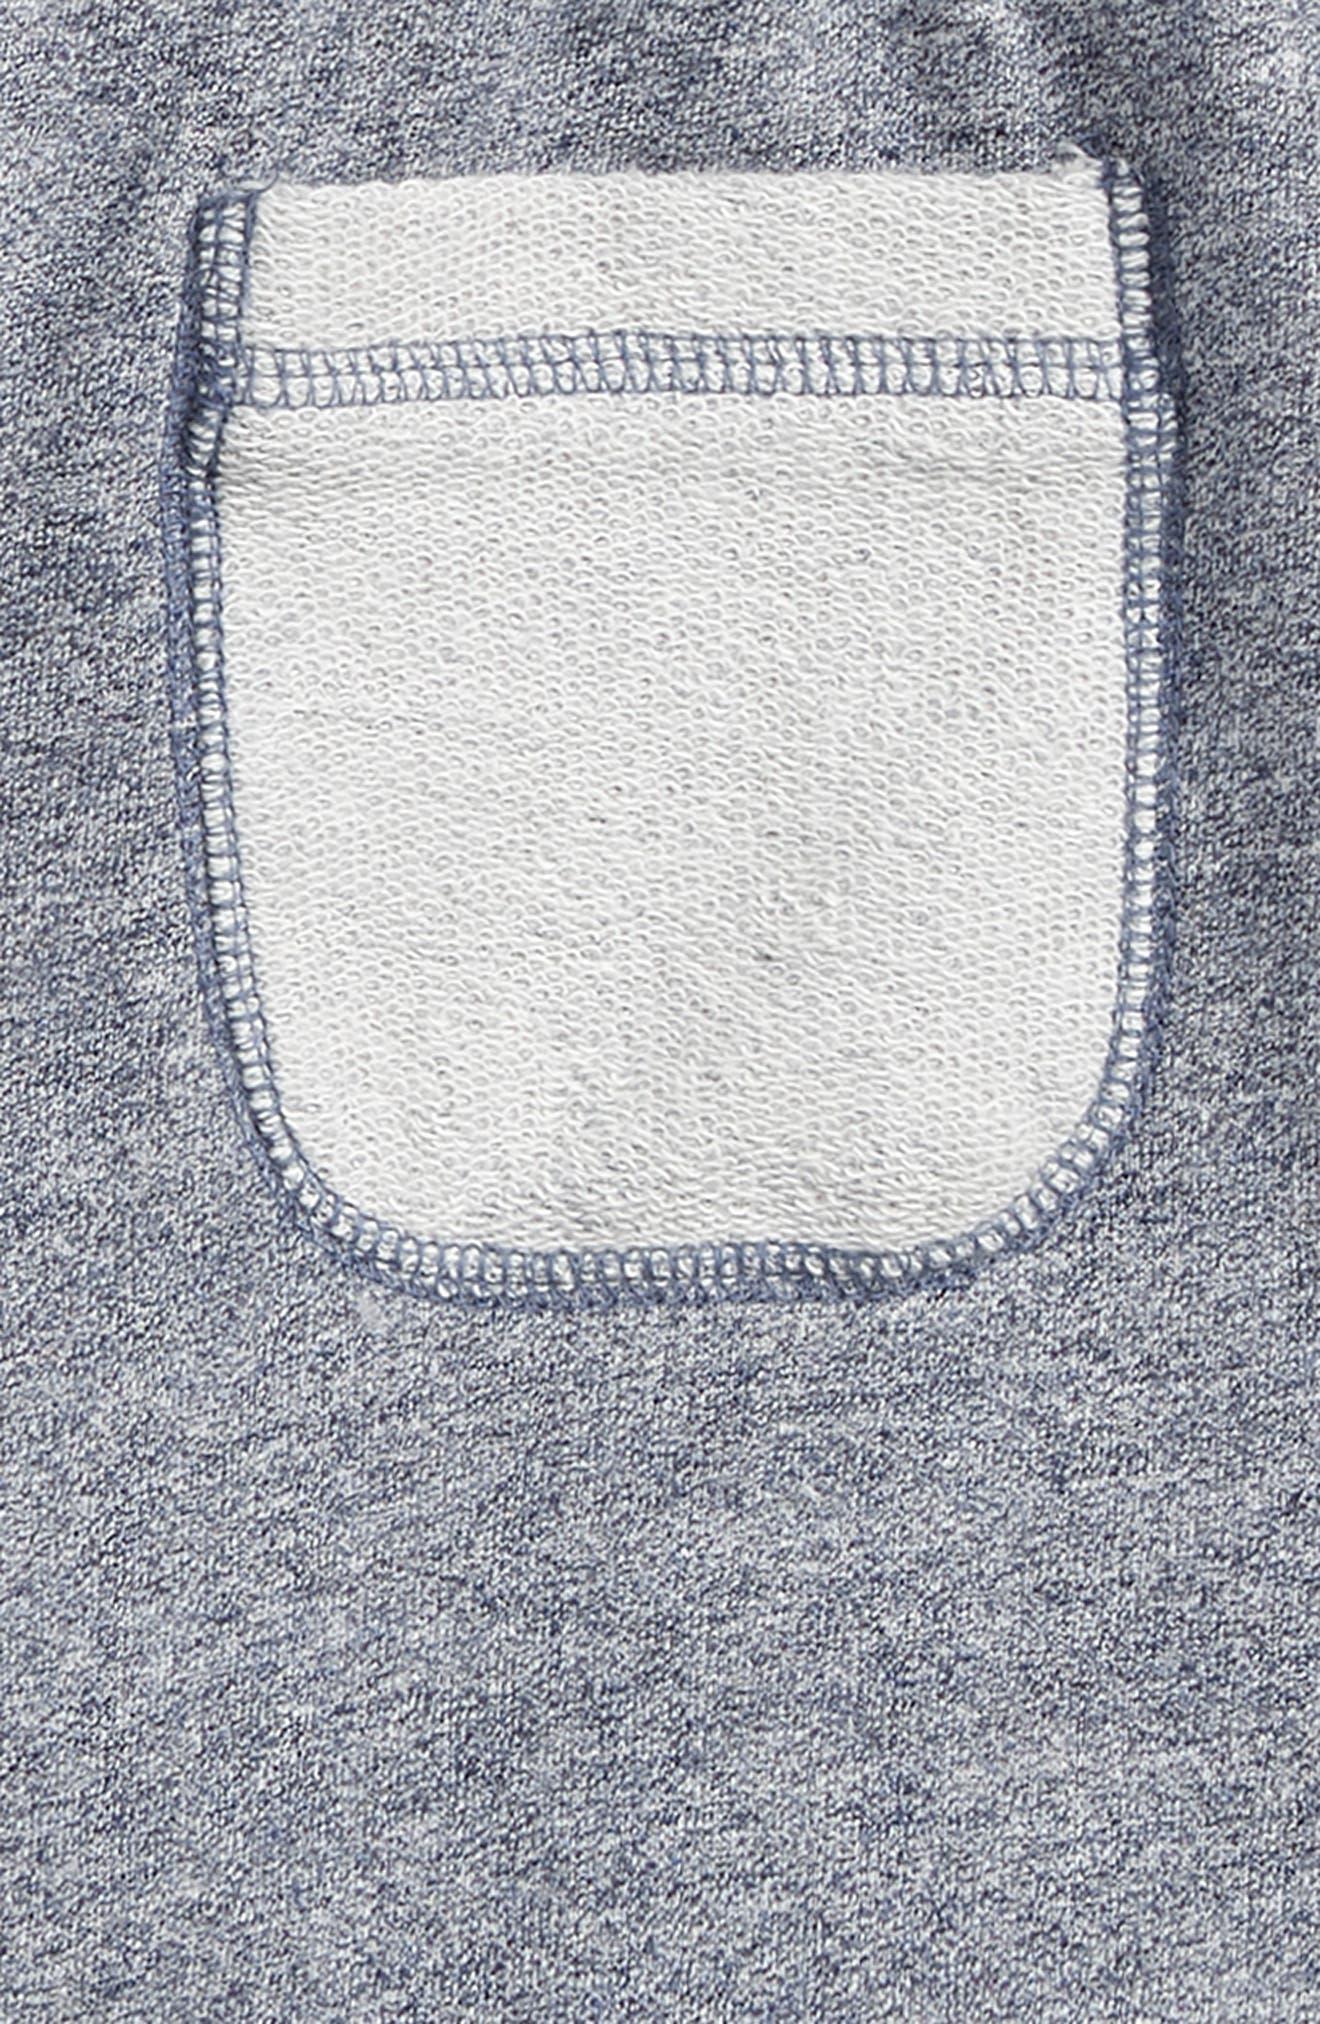 Fleece Shorts,                             Alternate thumbnail 3, color,                             Navy Denim